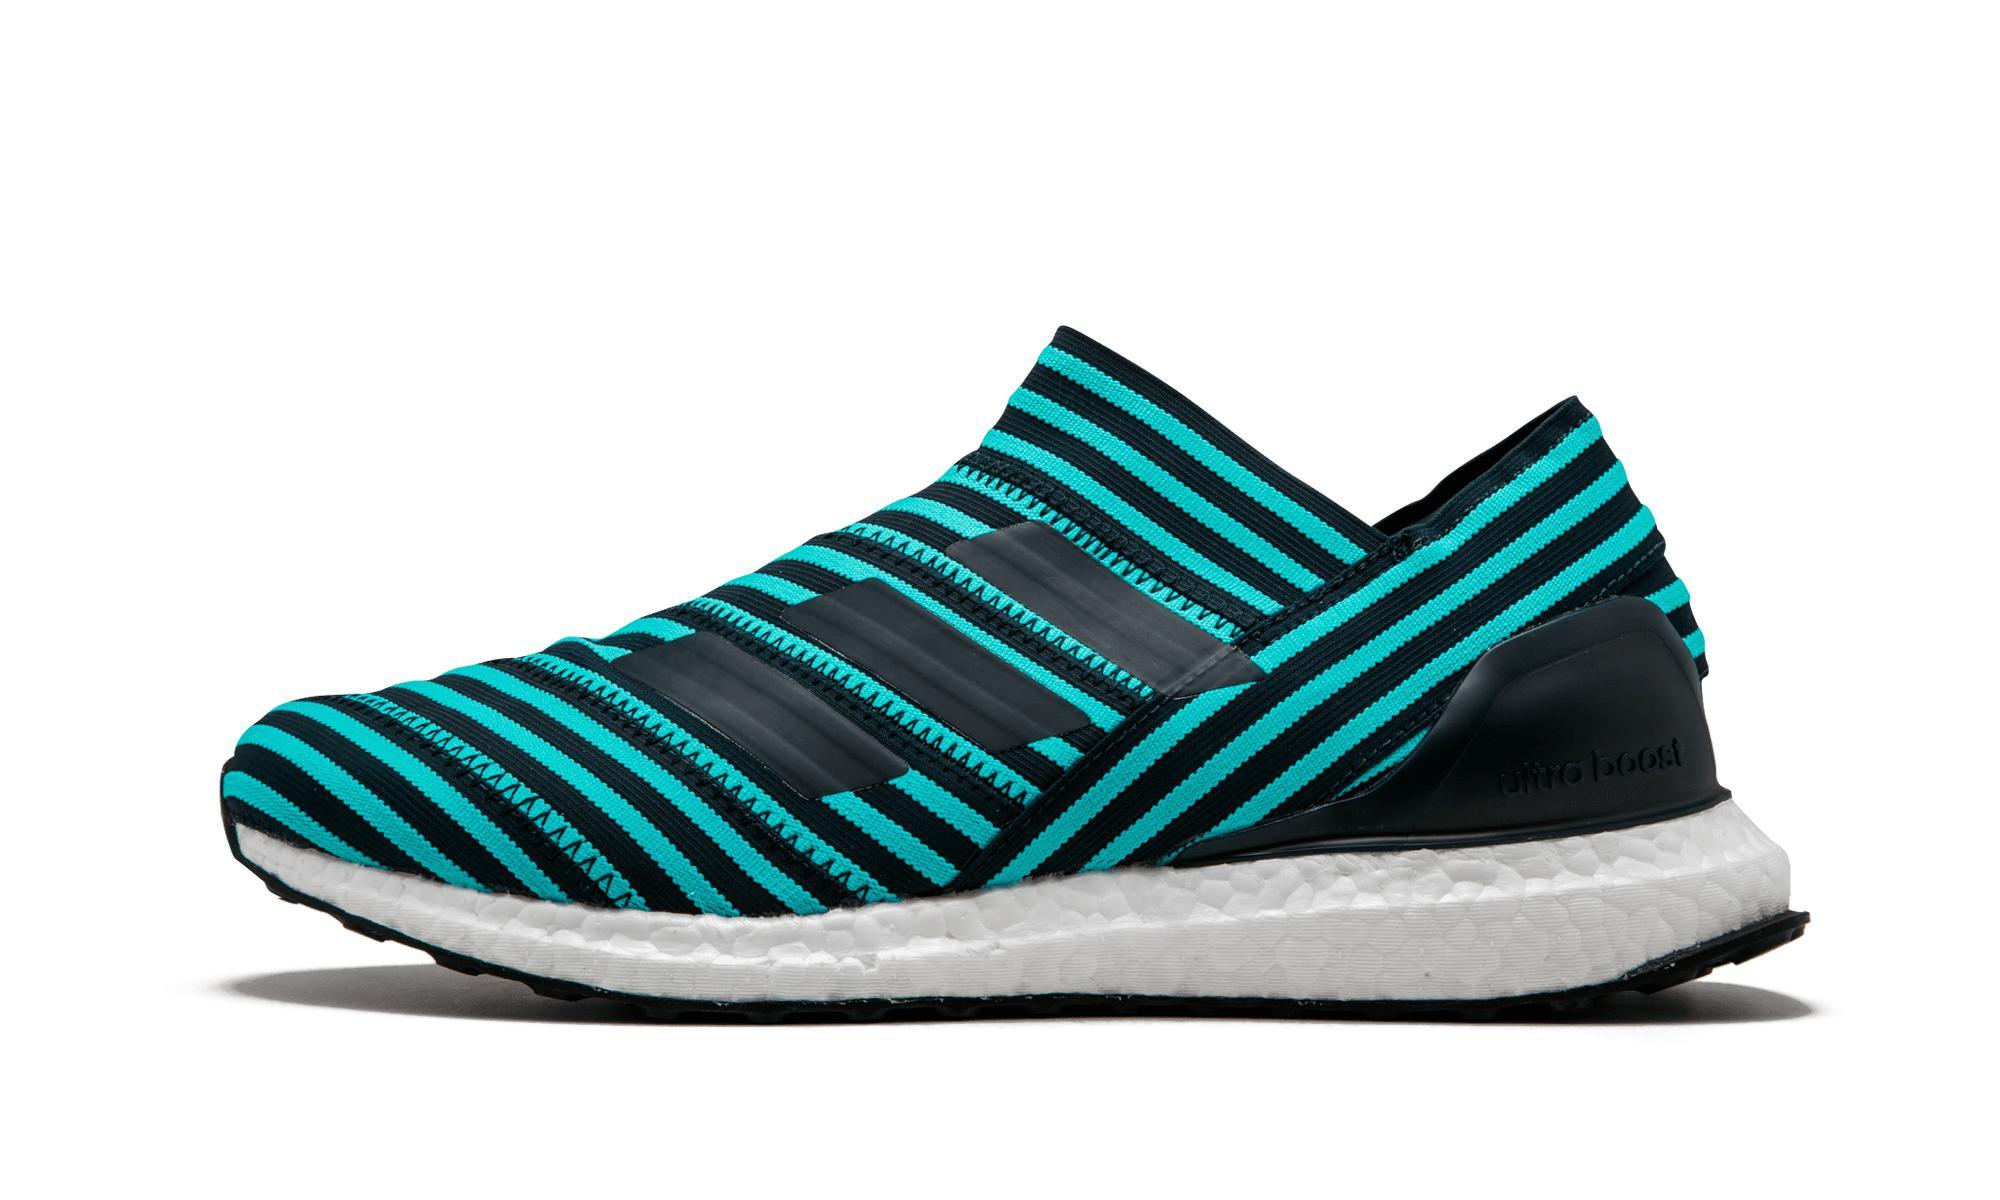 d1befe532 Lyst - adidas Nemeziz Tango 17+ 360 Agili in Blue for Men